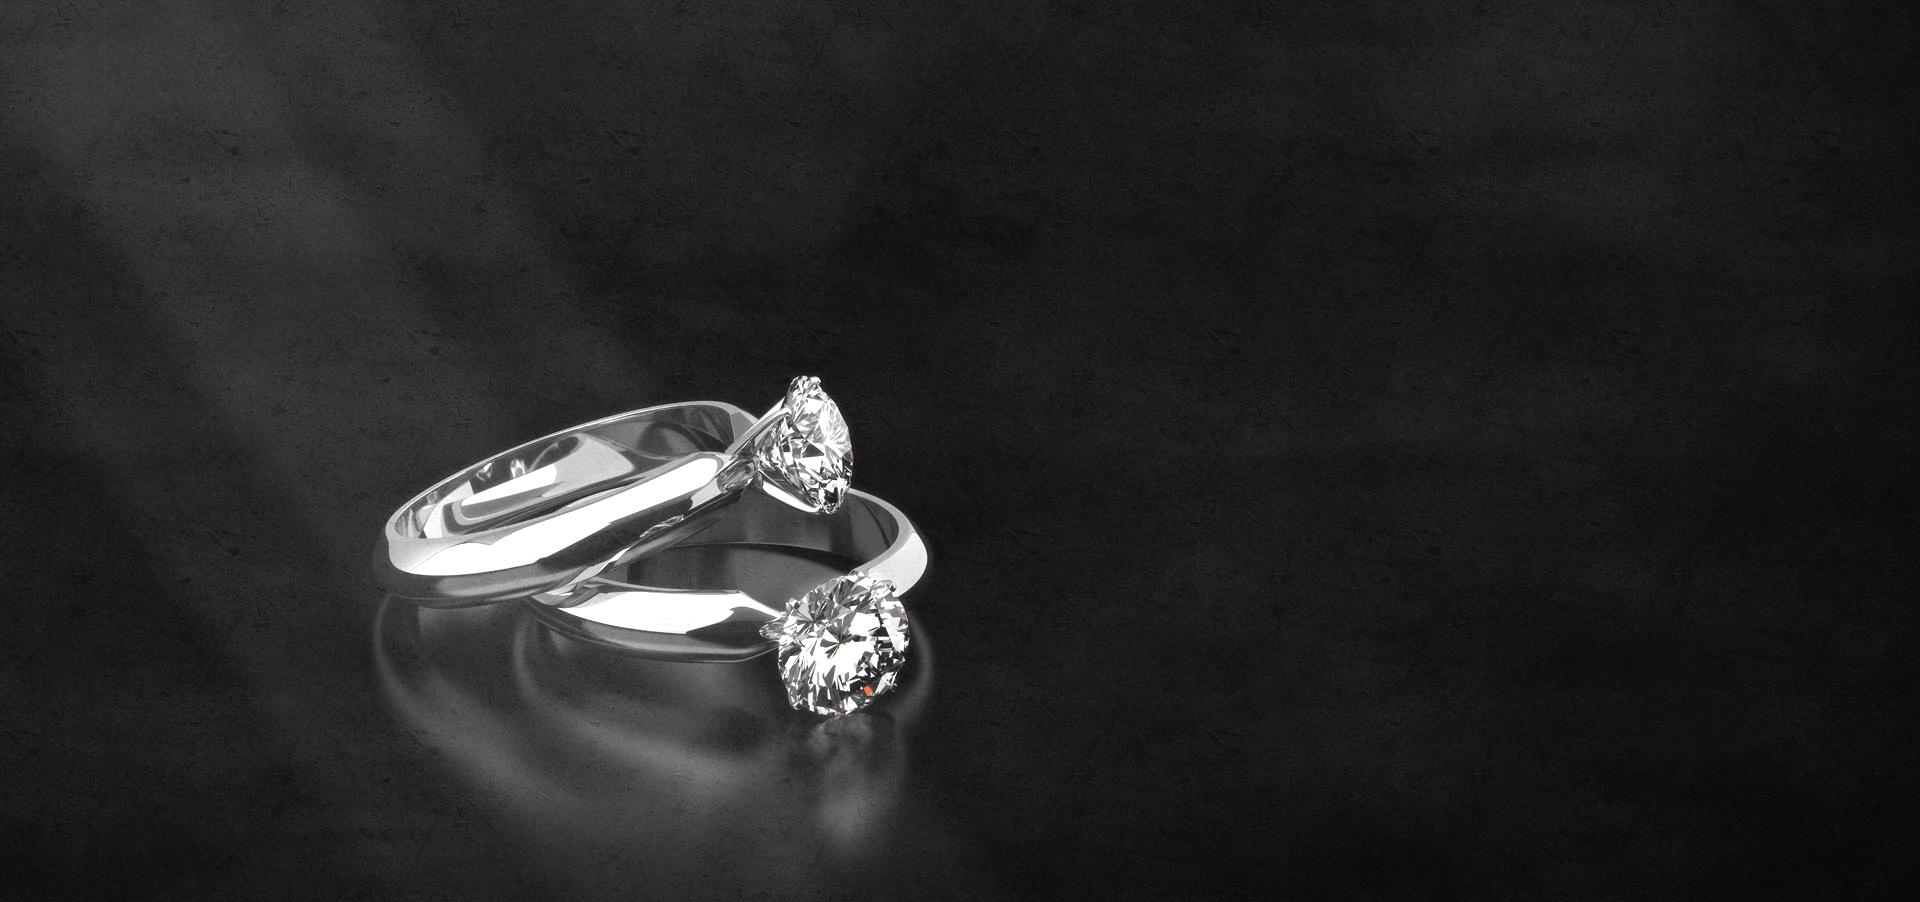 Kataw jewelers - Custom Jewelry Design & Repair - Jewlery CAD Design ...